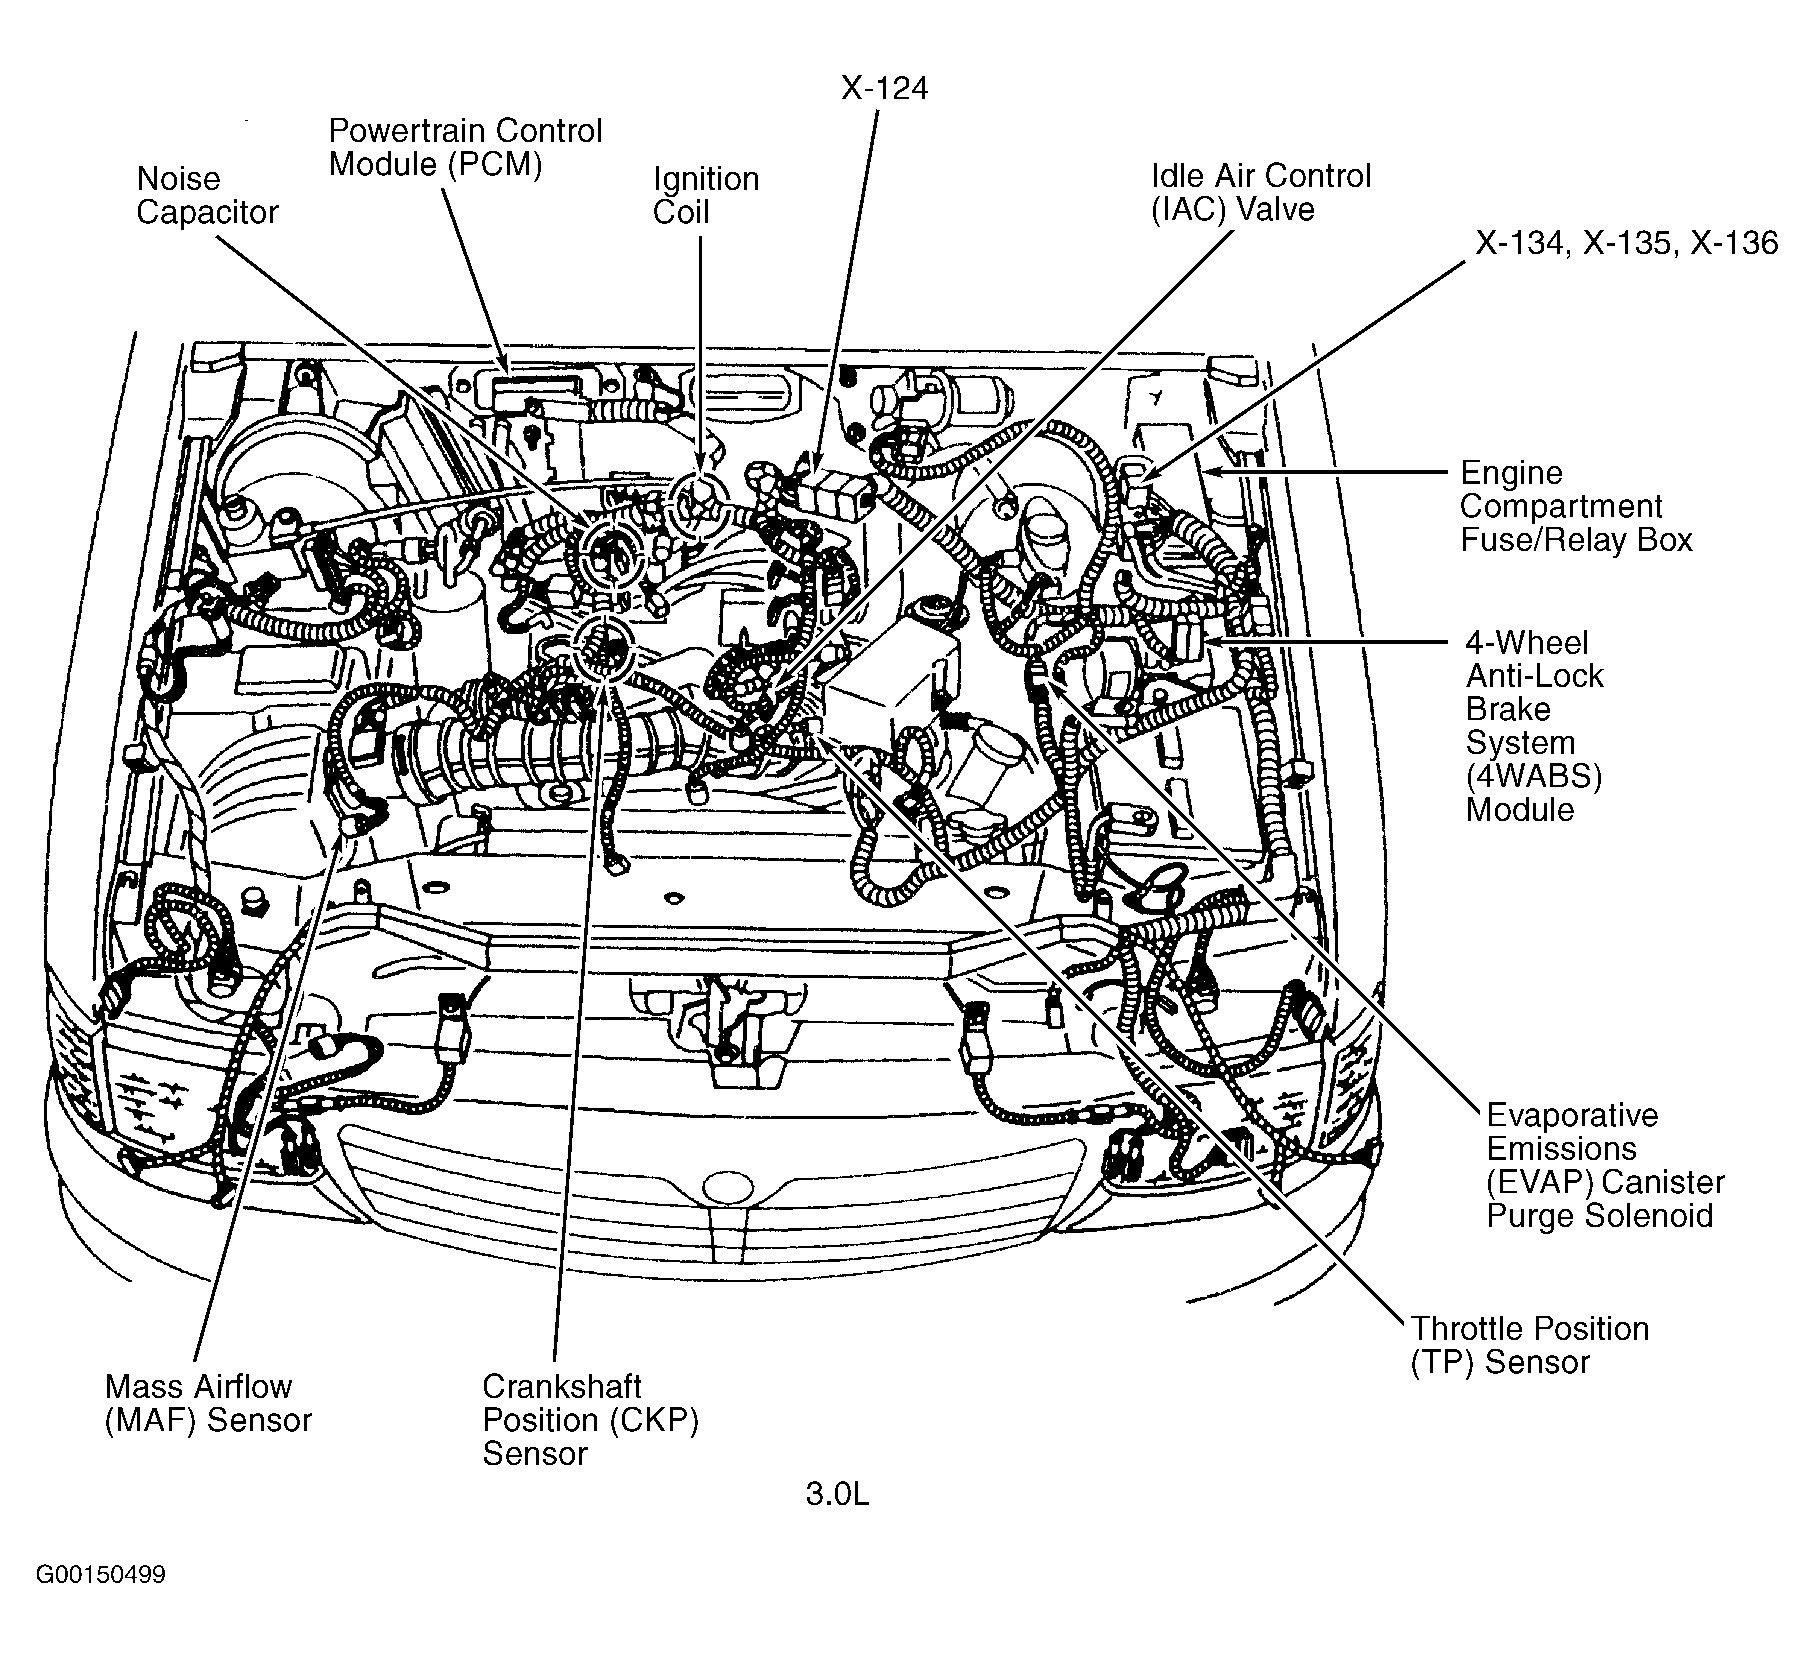 Audi Audi A4 Engine Diagram - Wiring Diagram Data lush-package -  lush-package.caffenerobollente.it | Audi Engine Schematics |  | Caffè nero bollente Caffè nero bollente